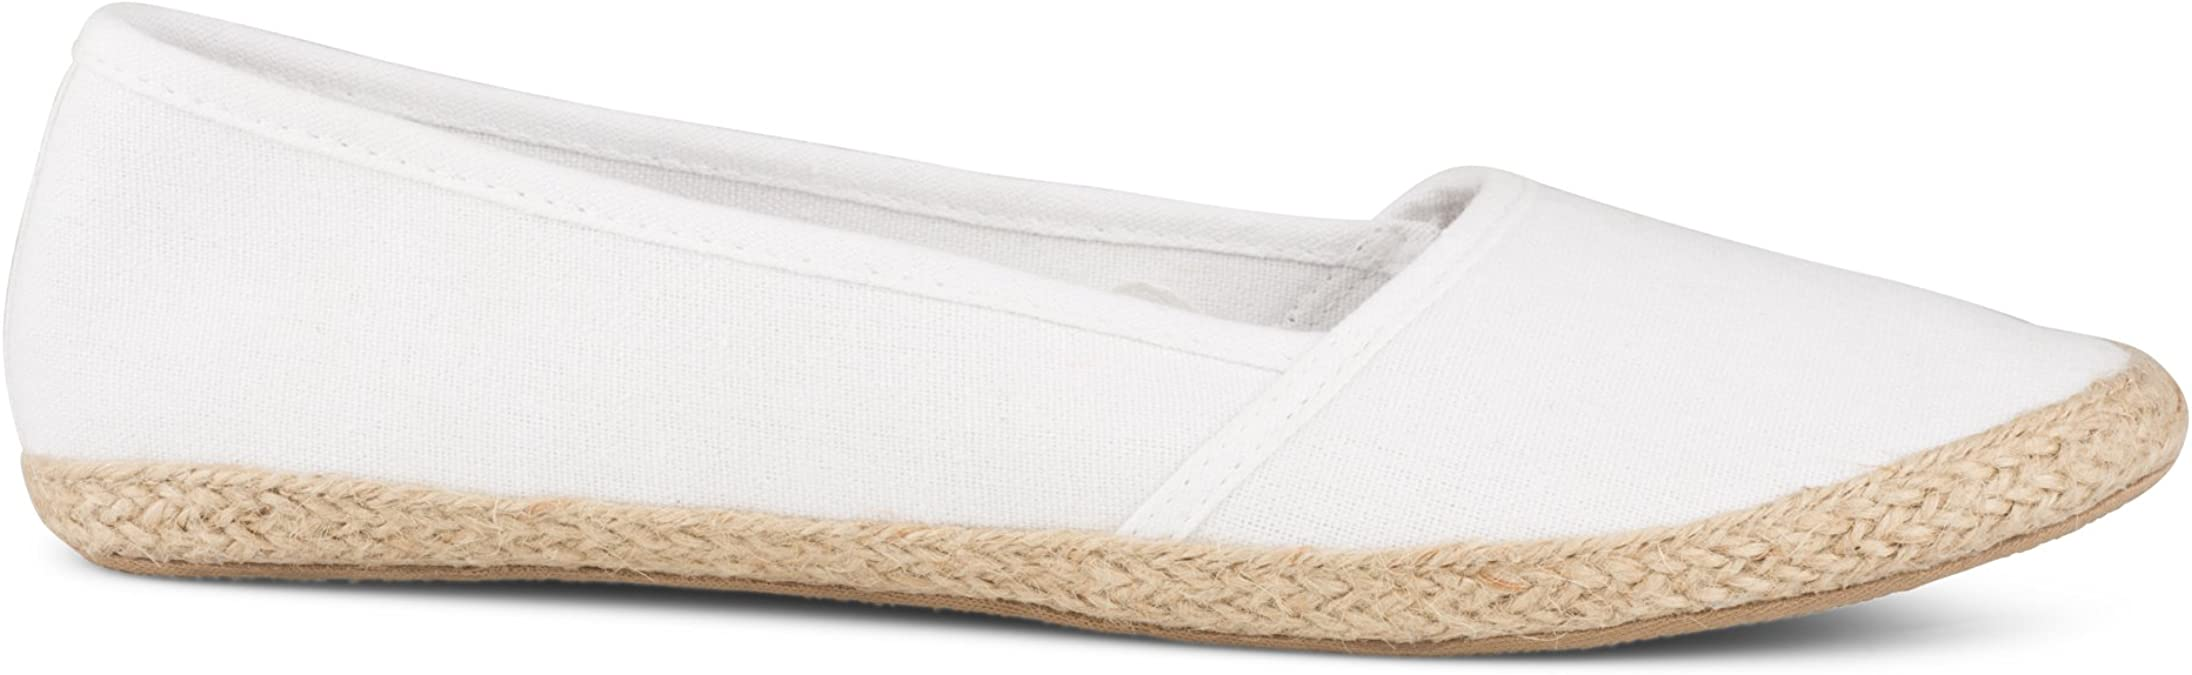 Ladies Canvas Slip-On Lightweight Shoes